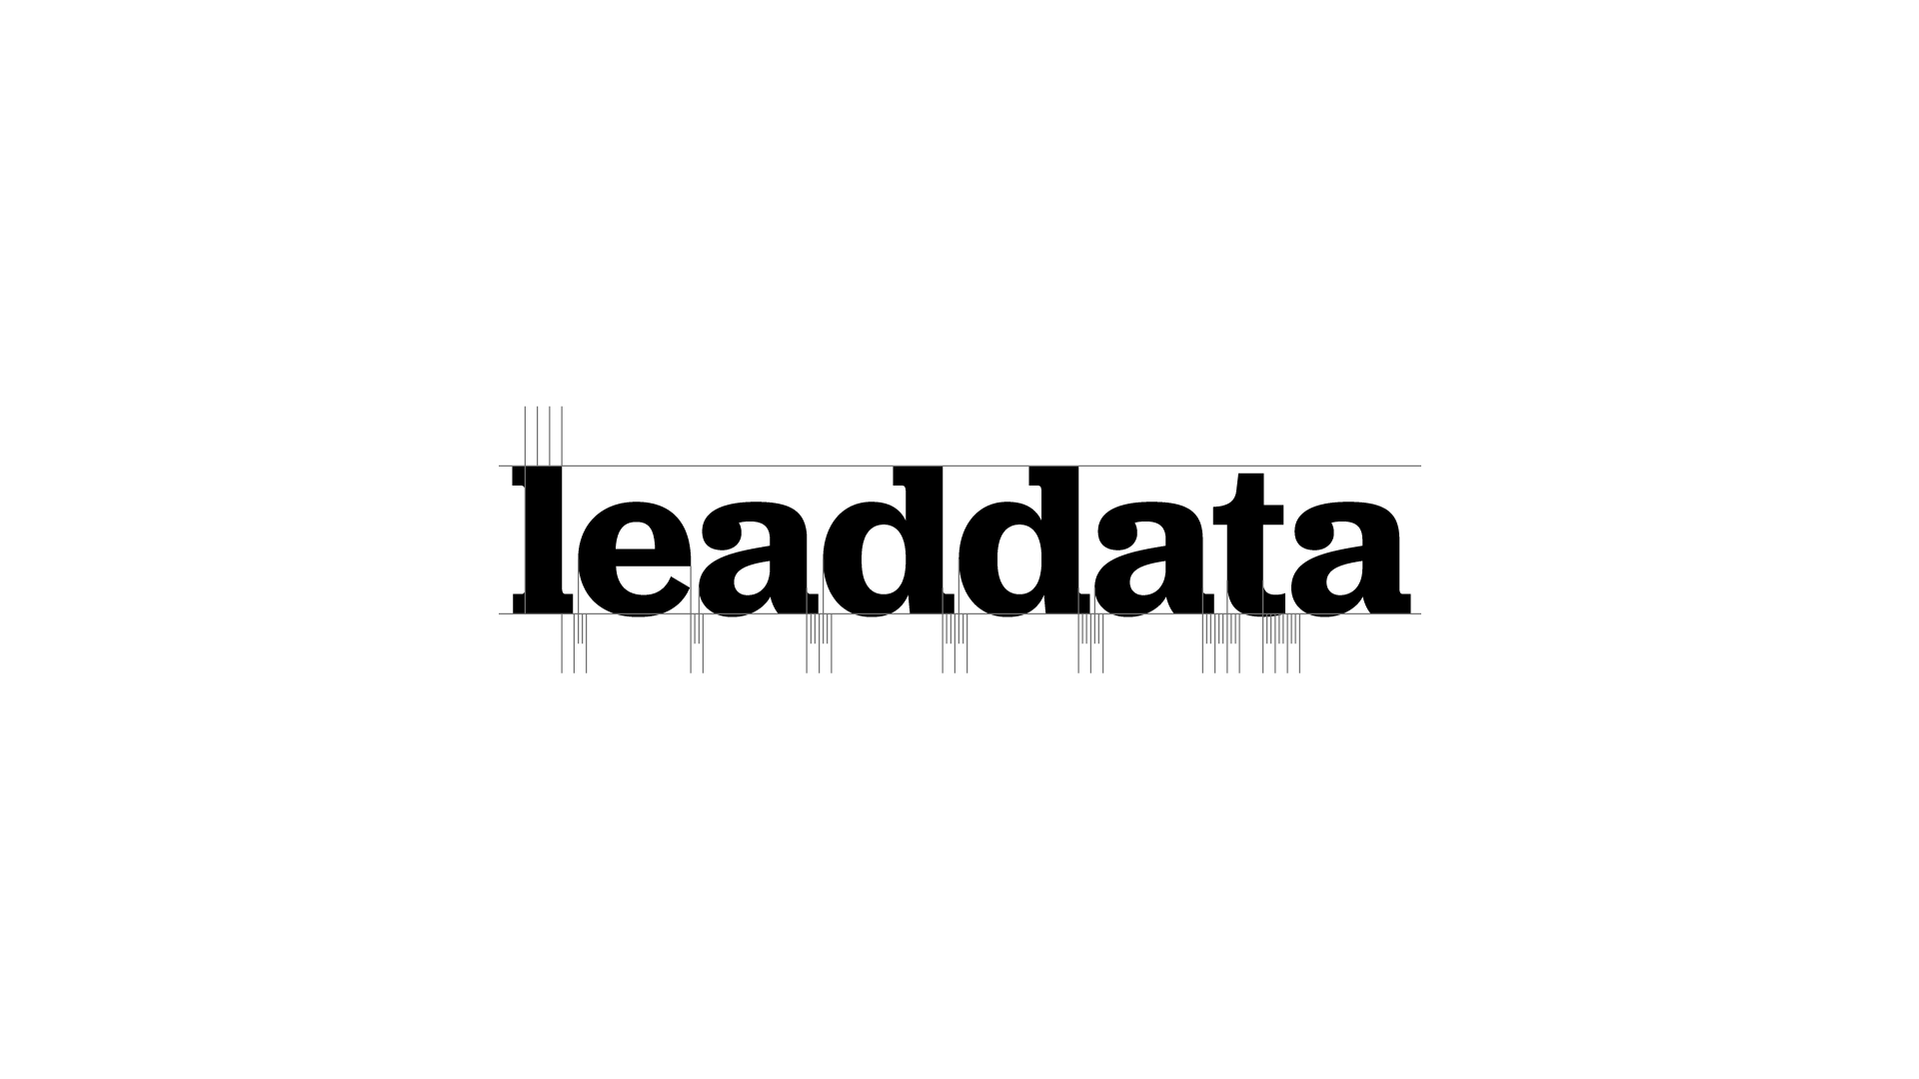 leaddata_simbolo_5.png